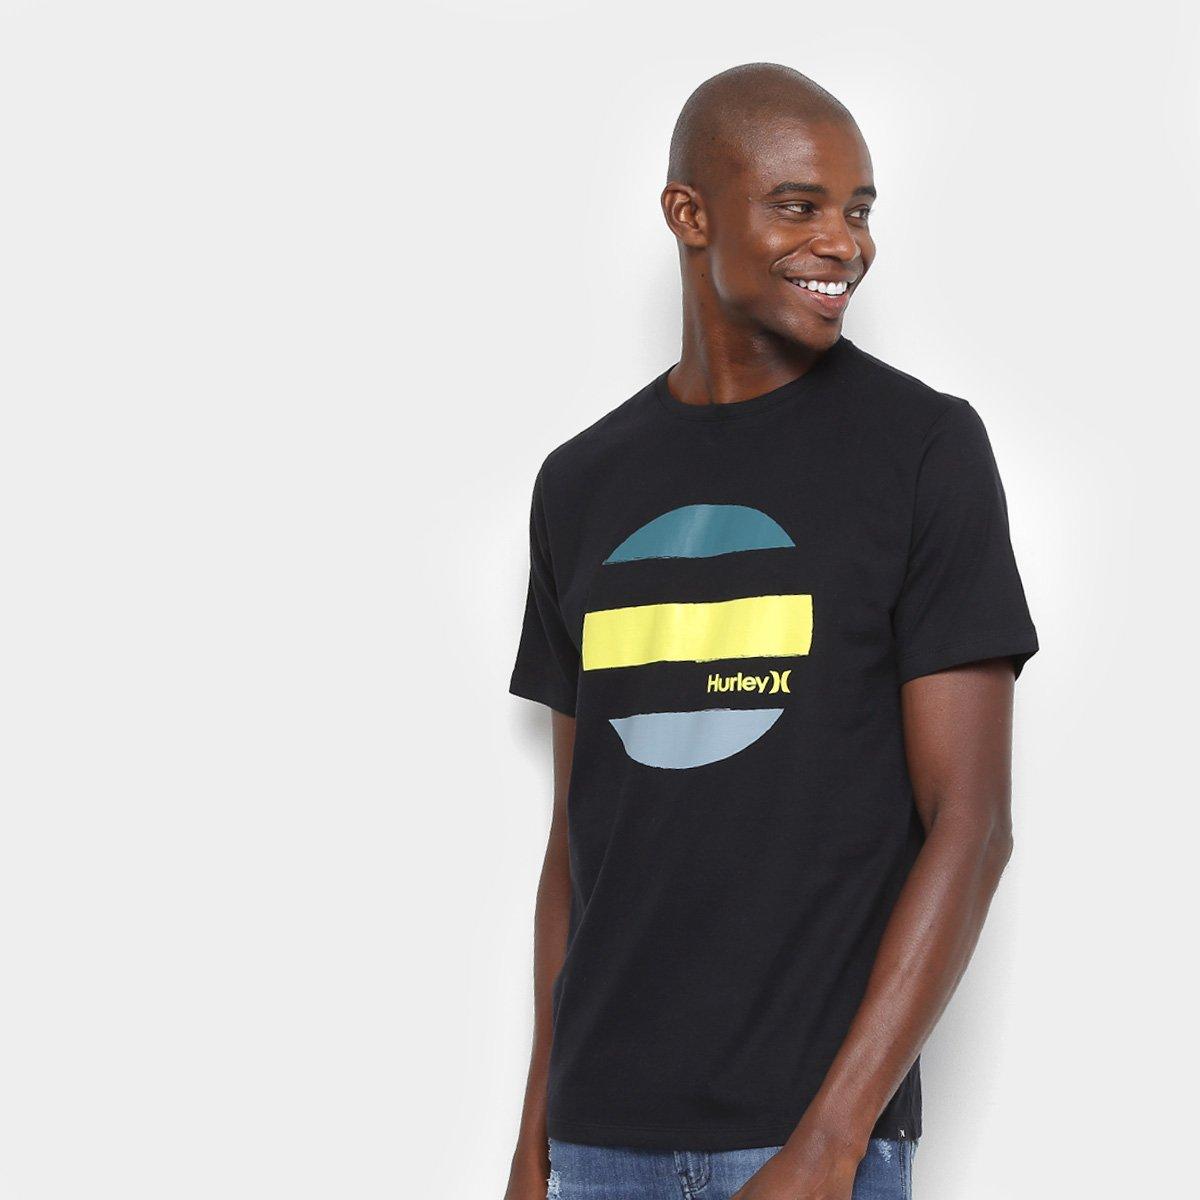 b976596fd3 Camiseta Hurley Silk Drive Through Masculina - Preto - Compre Agora ...